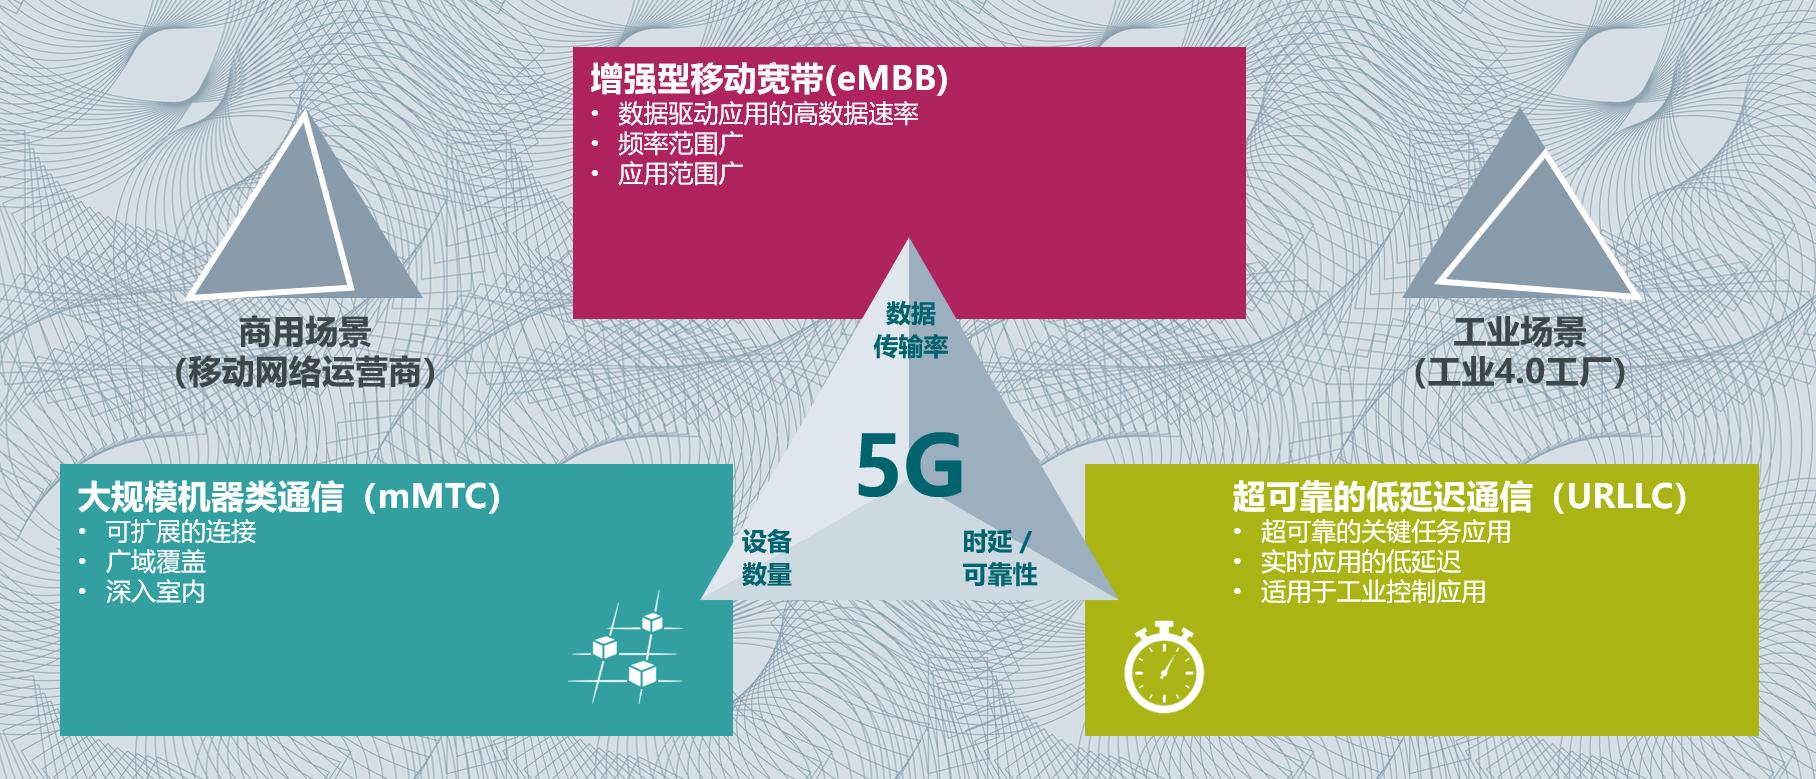 3GPP定义的5G三大应用场景